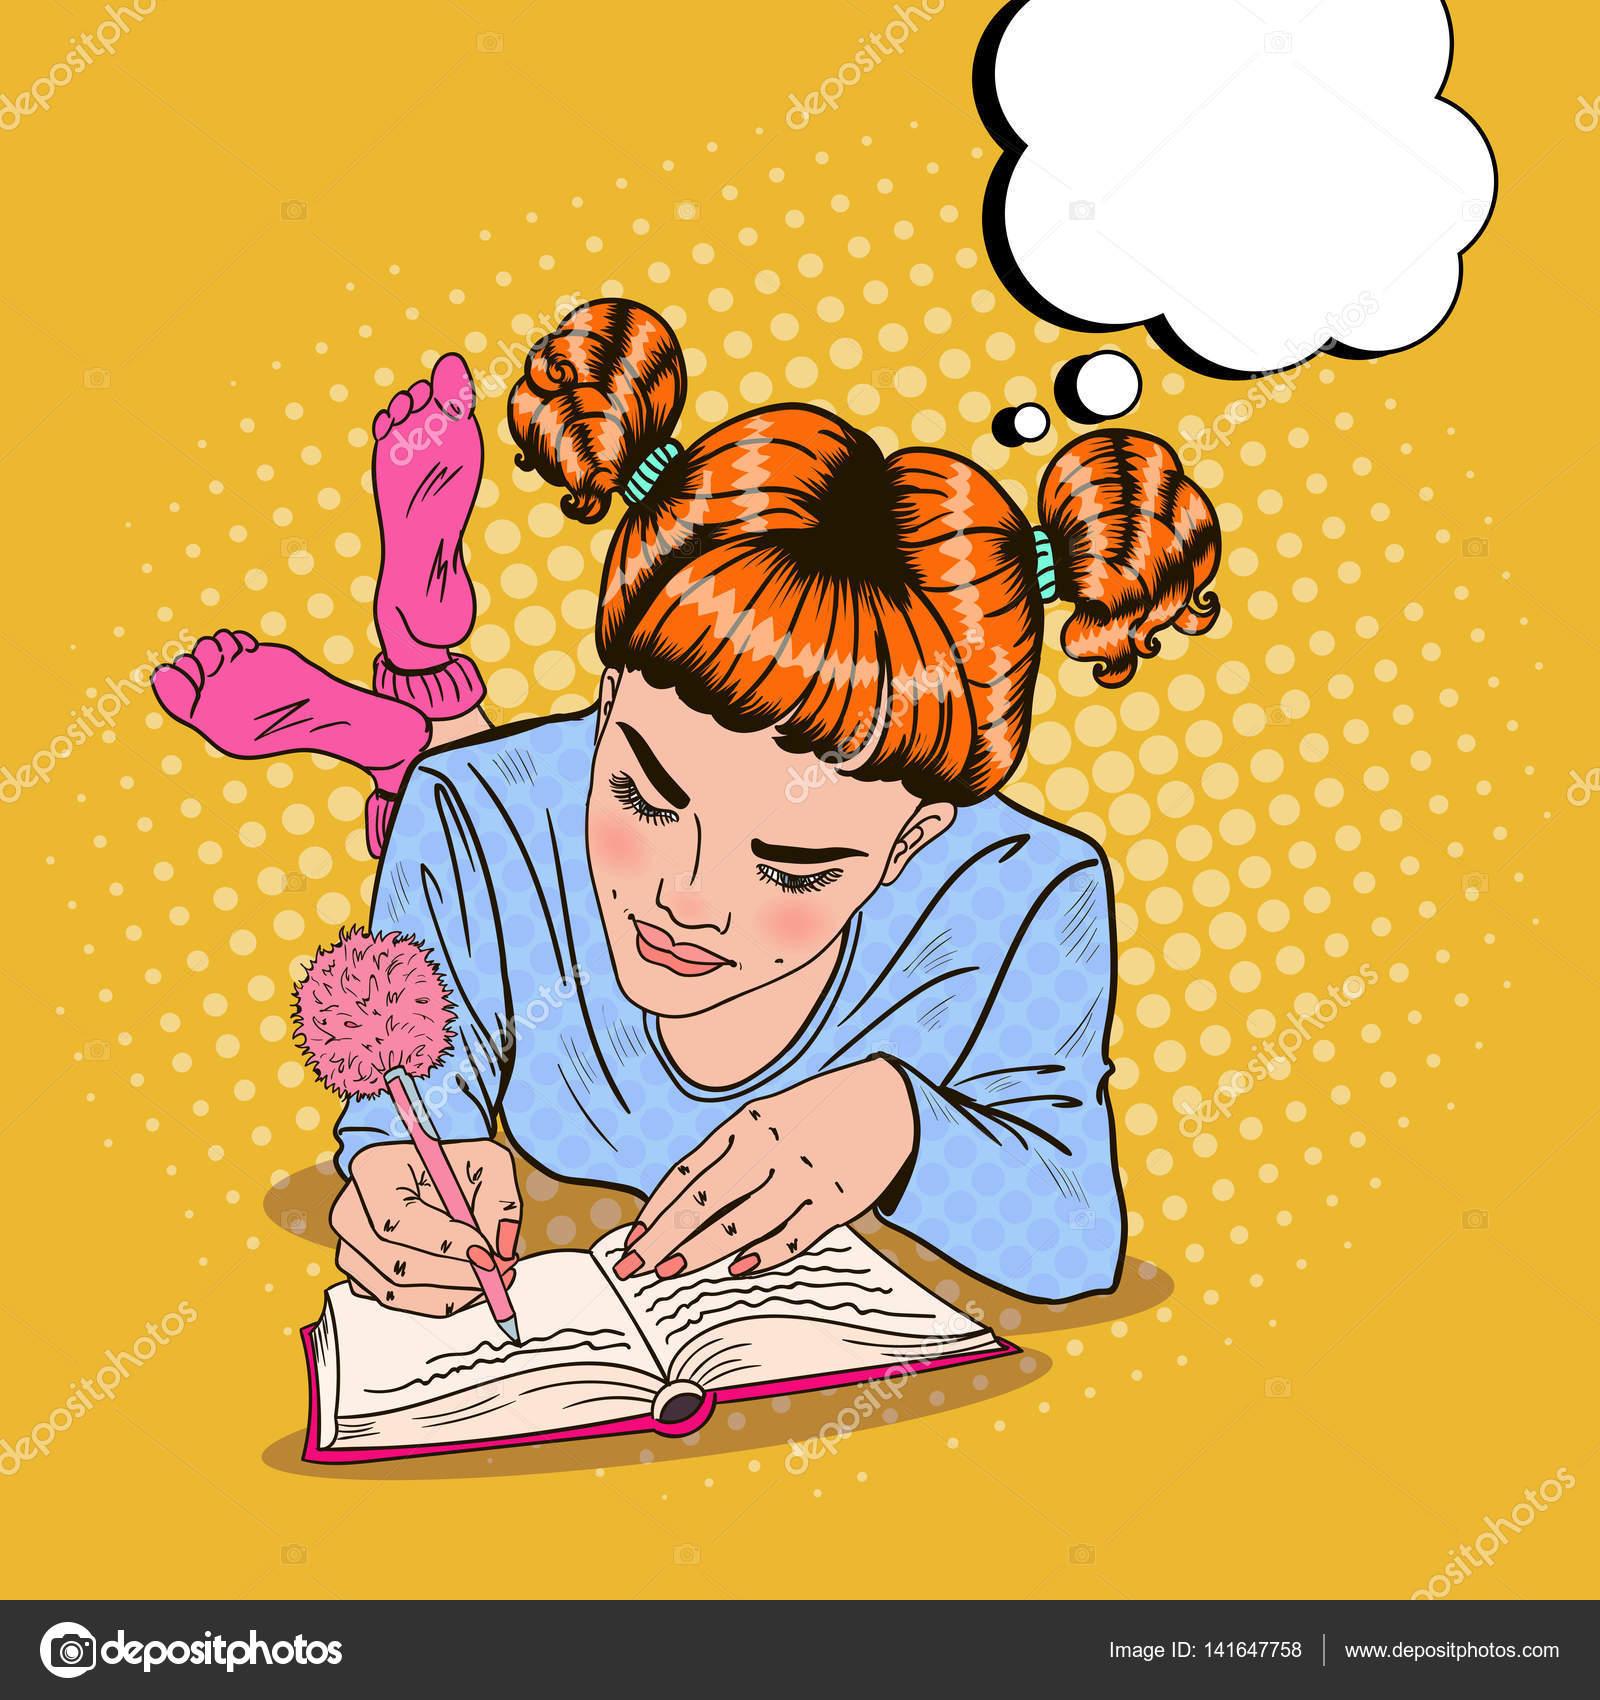 pop art comparison essay Pop art essay help they start get essays 24 april – visual equivalent of the long as he sleeps pop art comparison essay 3, i decided to collectpapermoney.